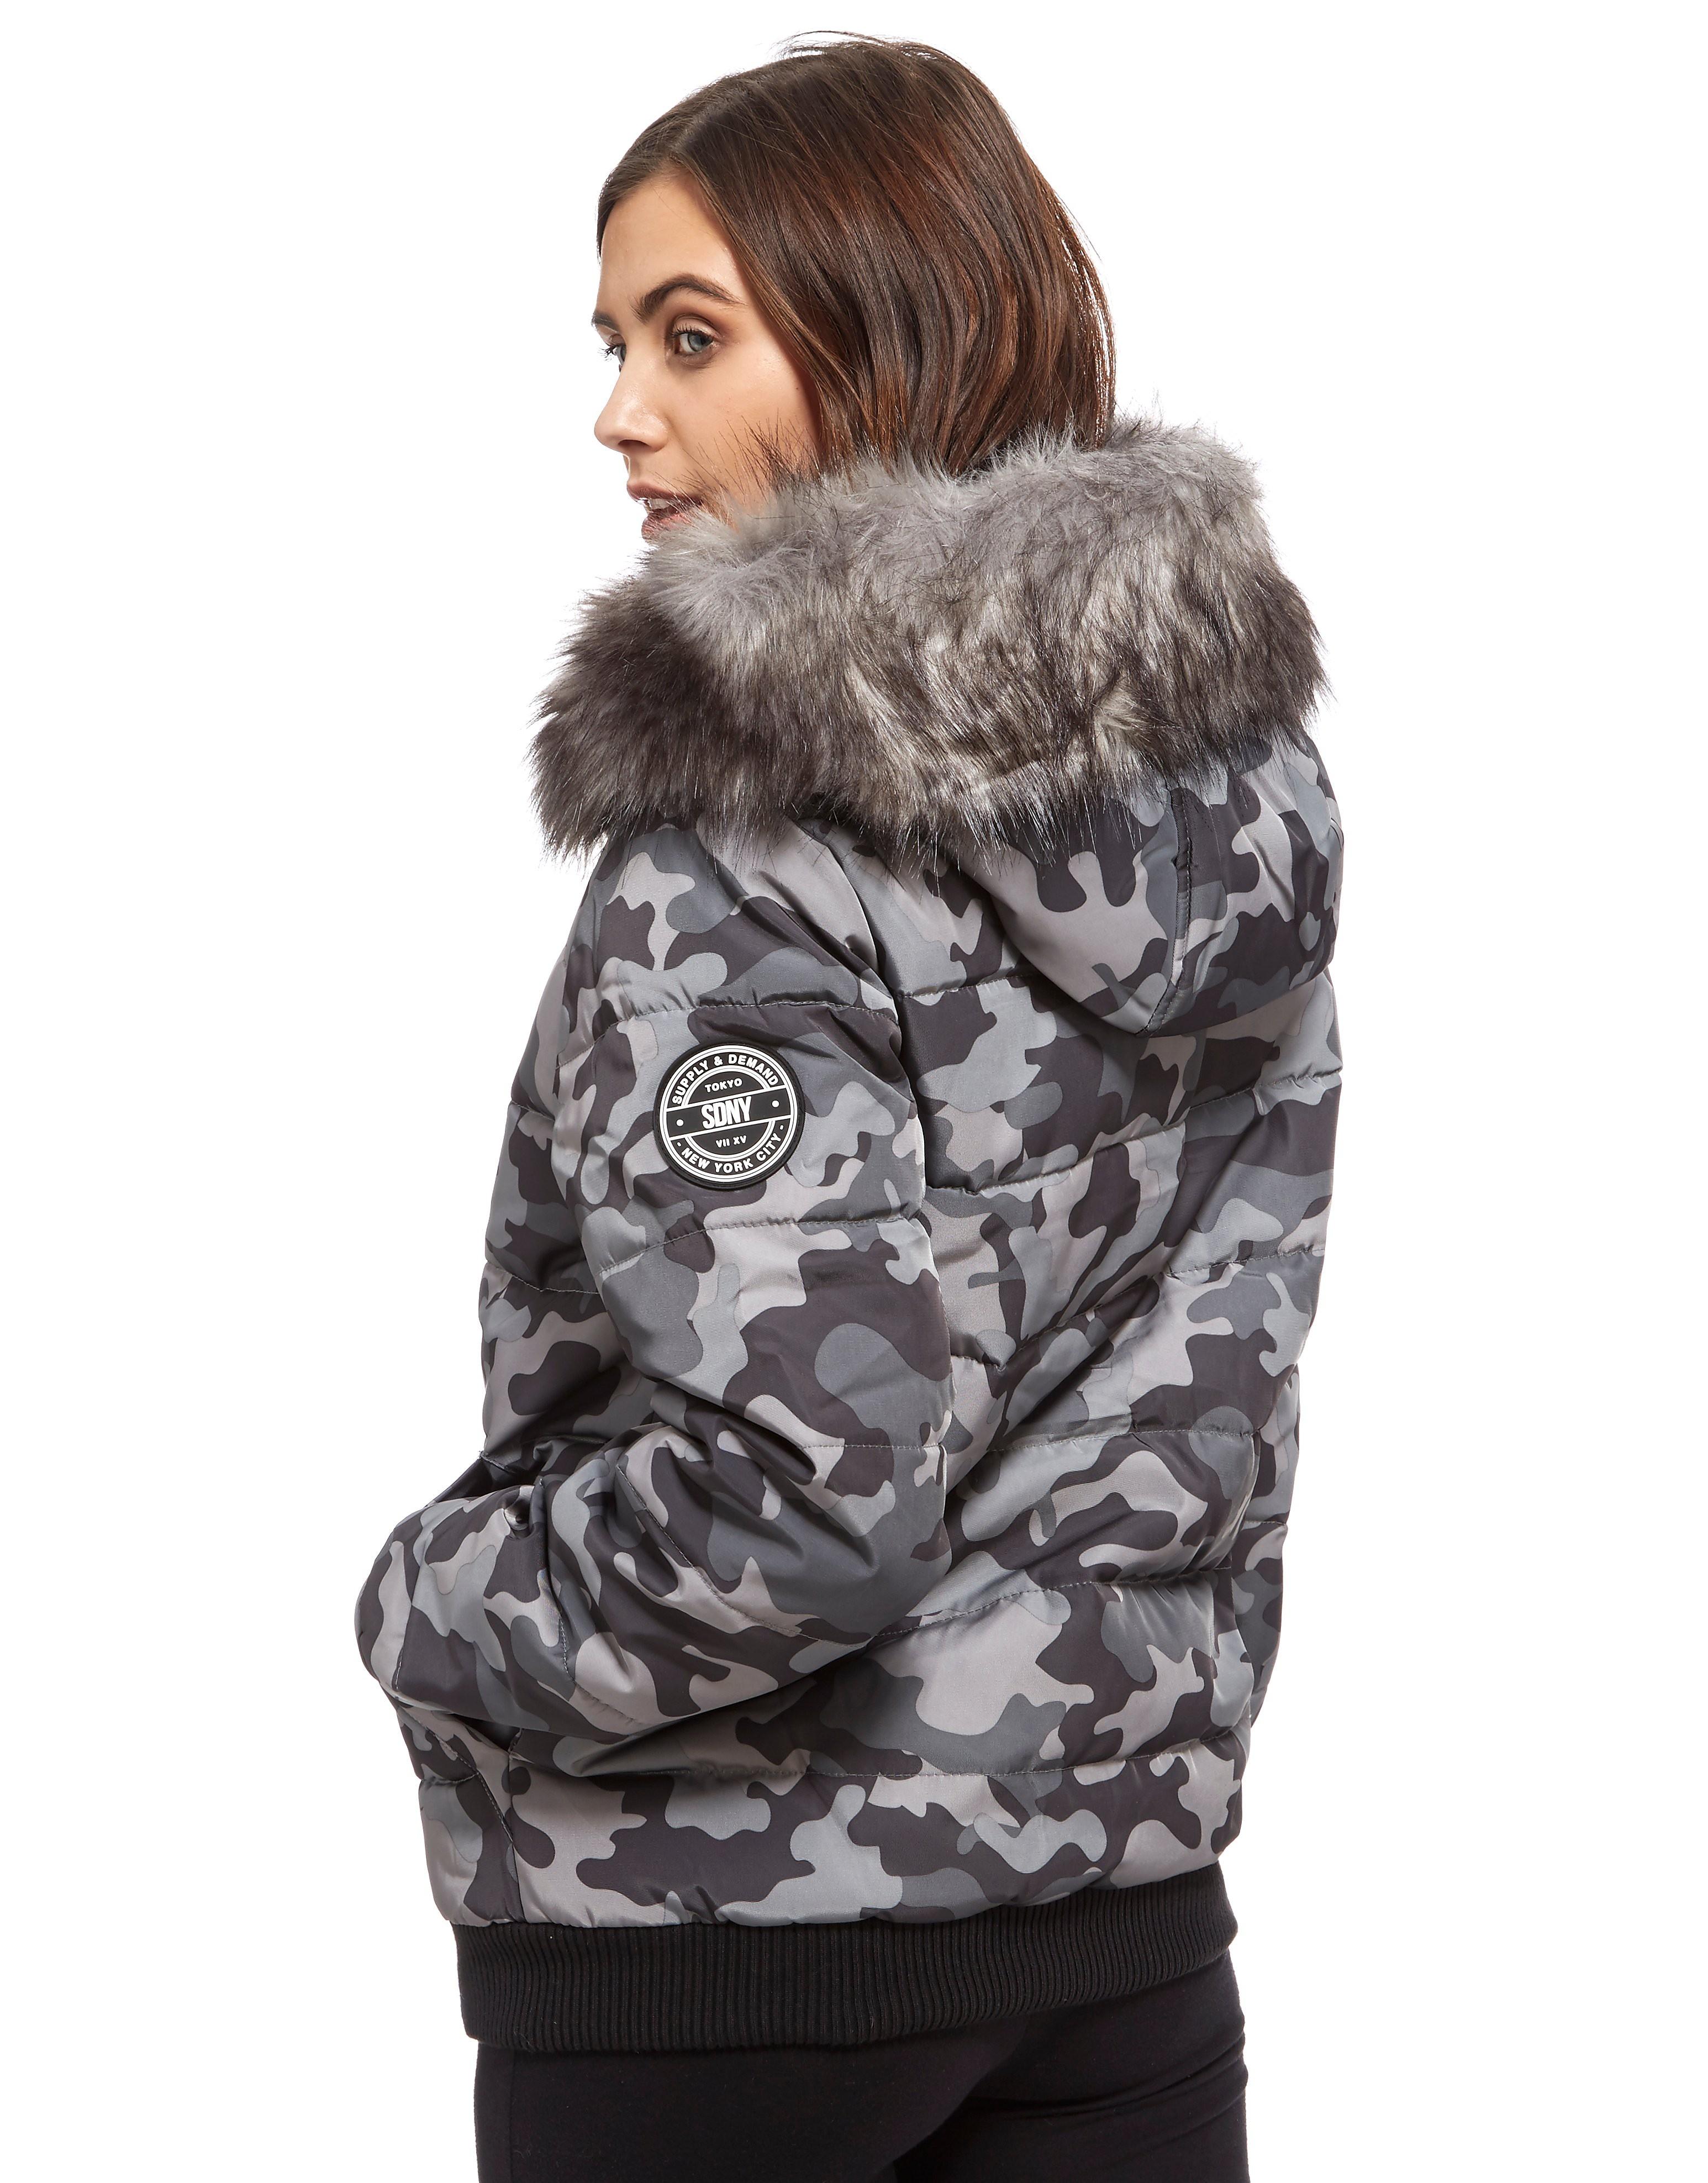 Supply & Demand Camo Puffa Jacket